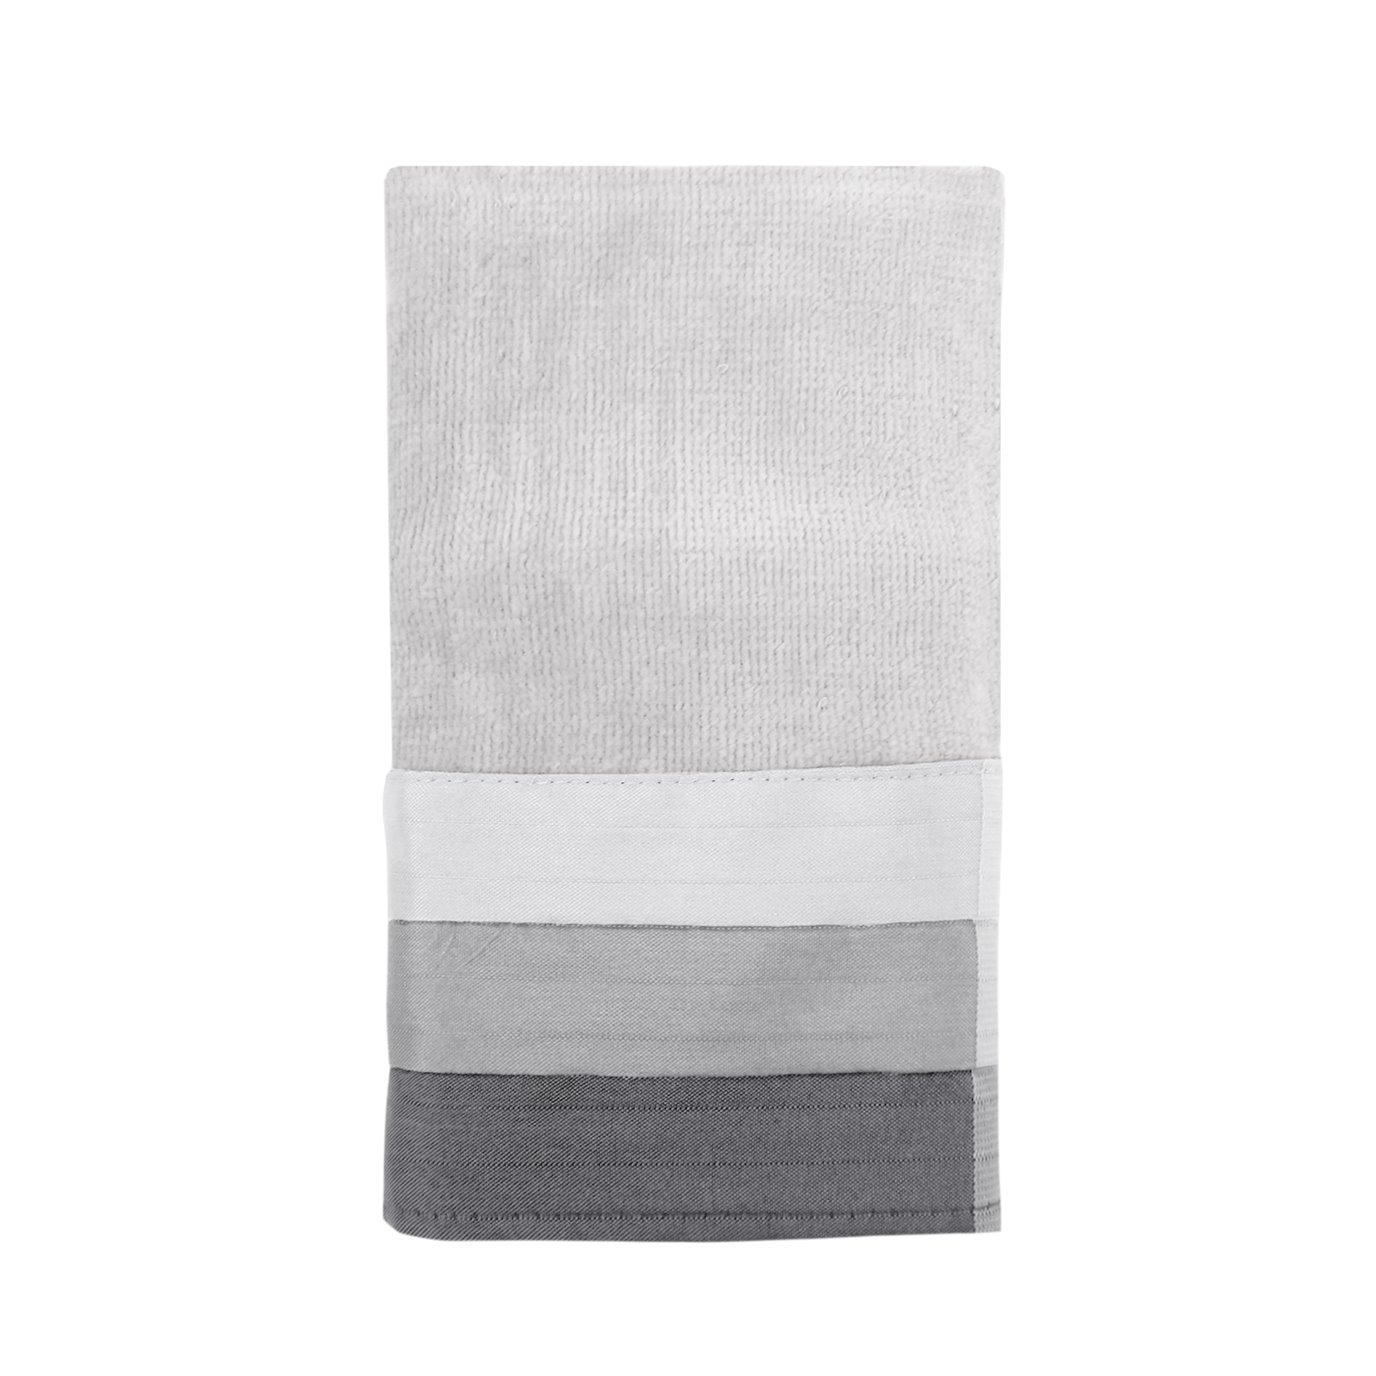 Fairfax Fingertip Towel Black 11X18